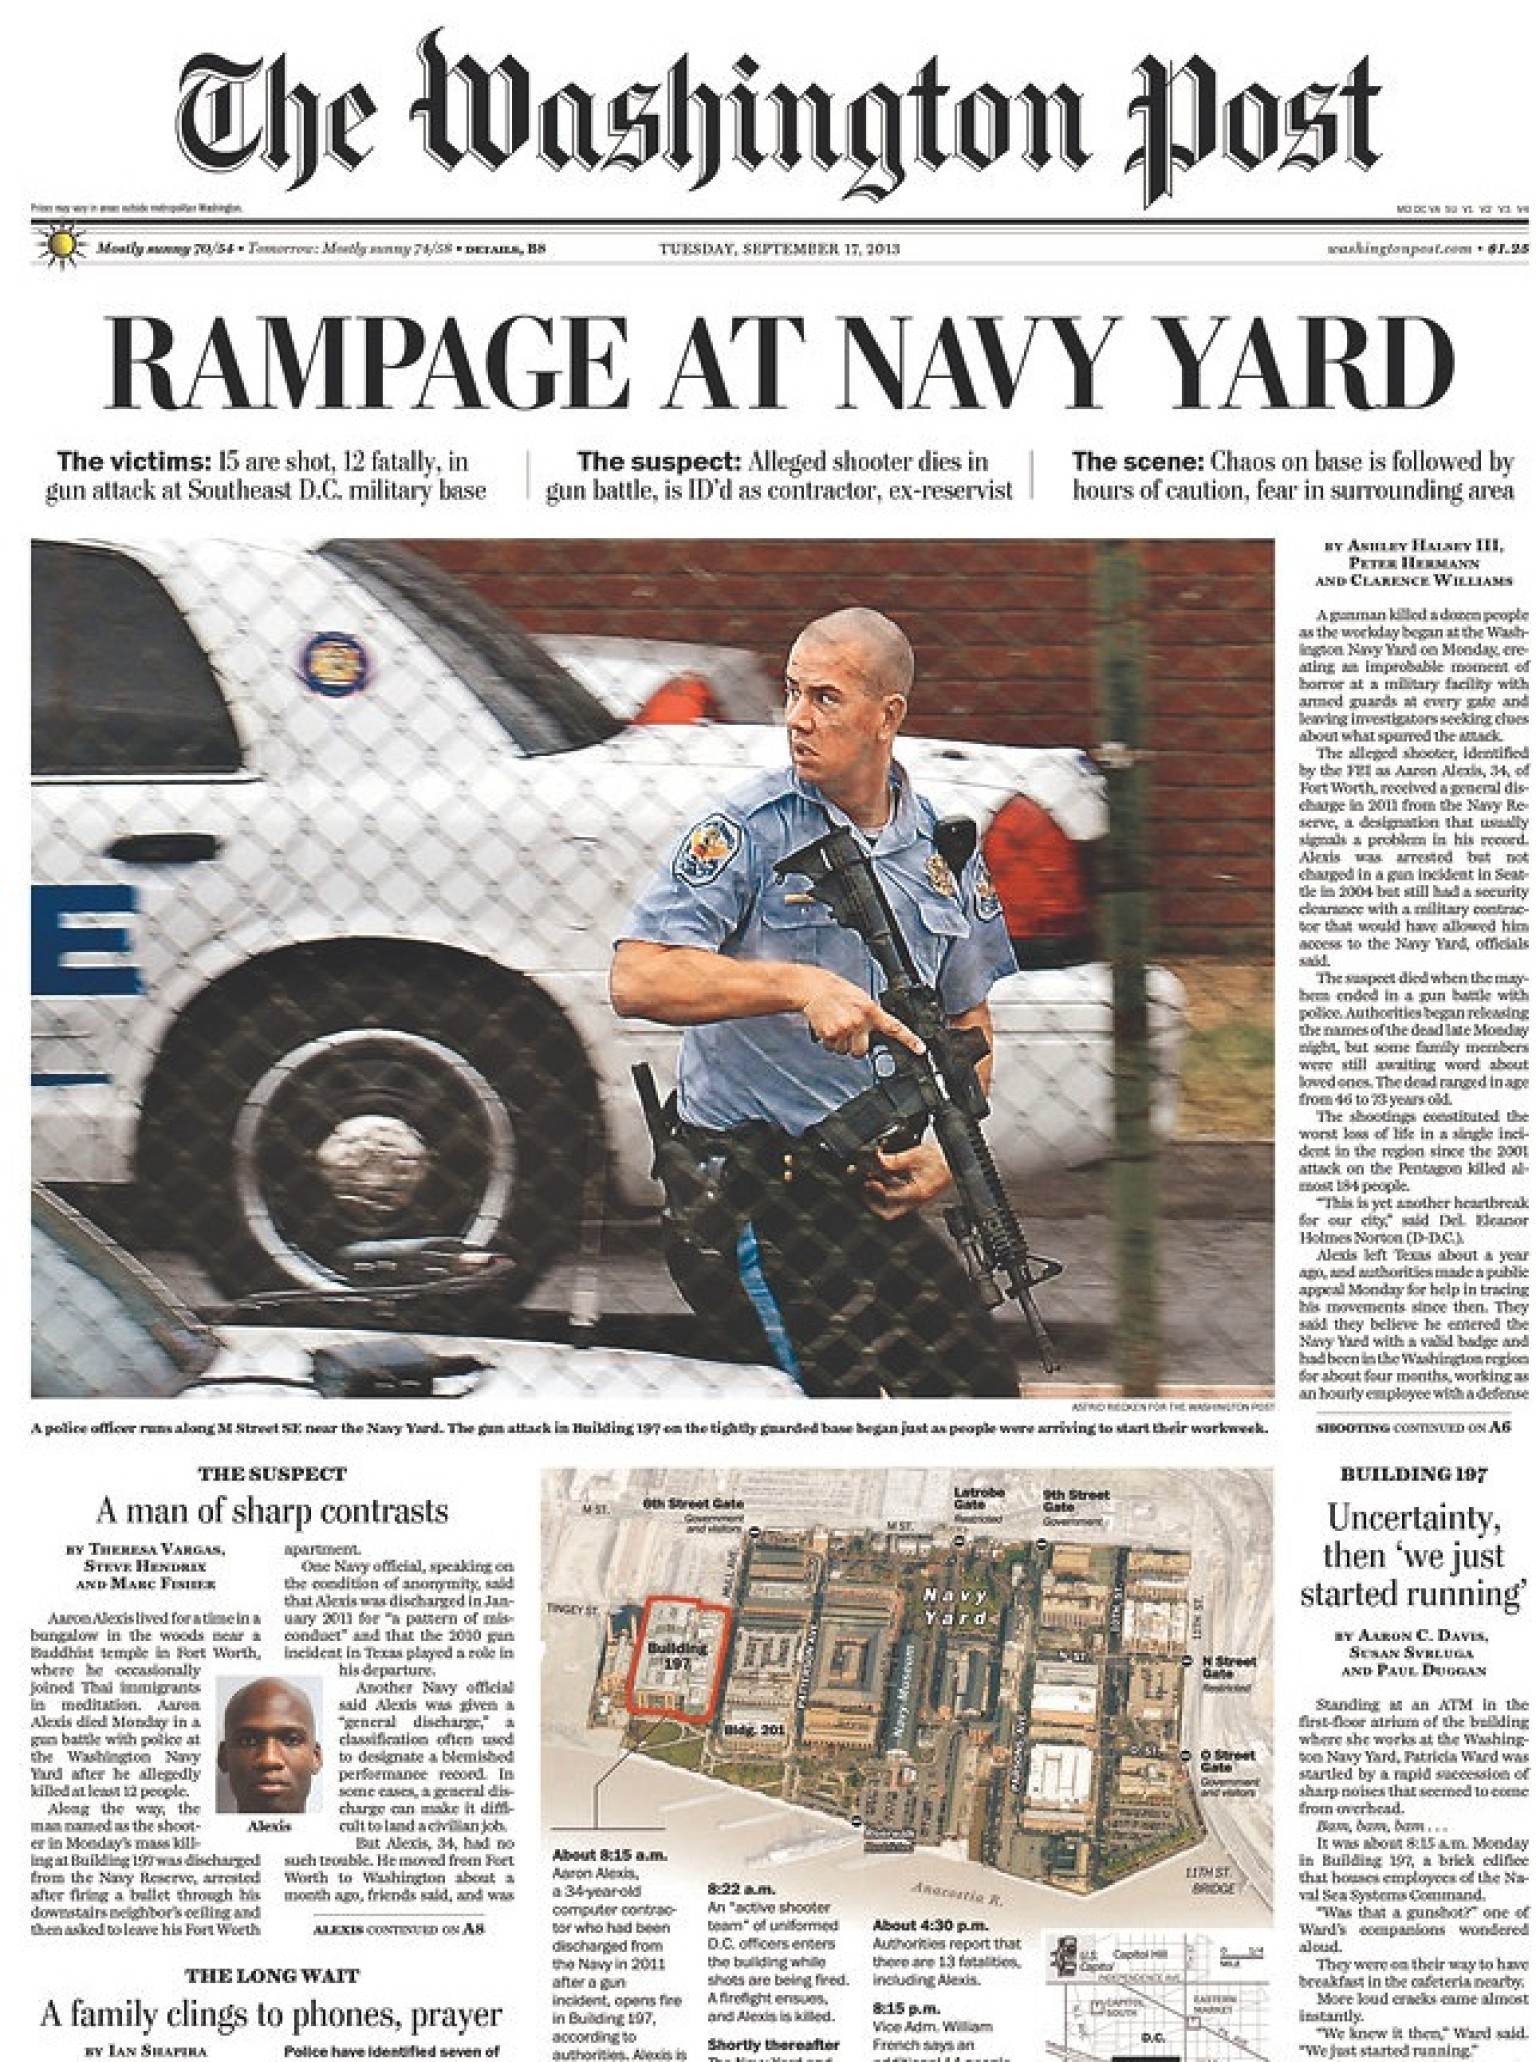 Washington Post Editor Navy Yard Shooting Story Was